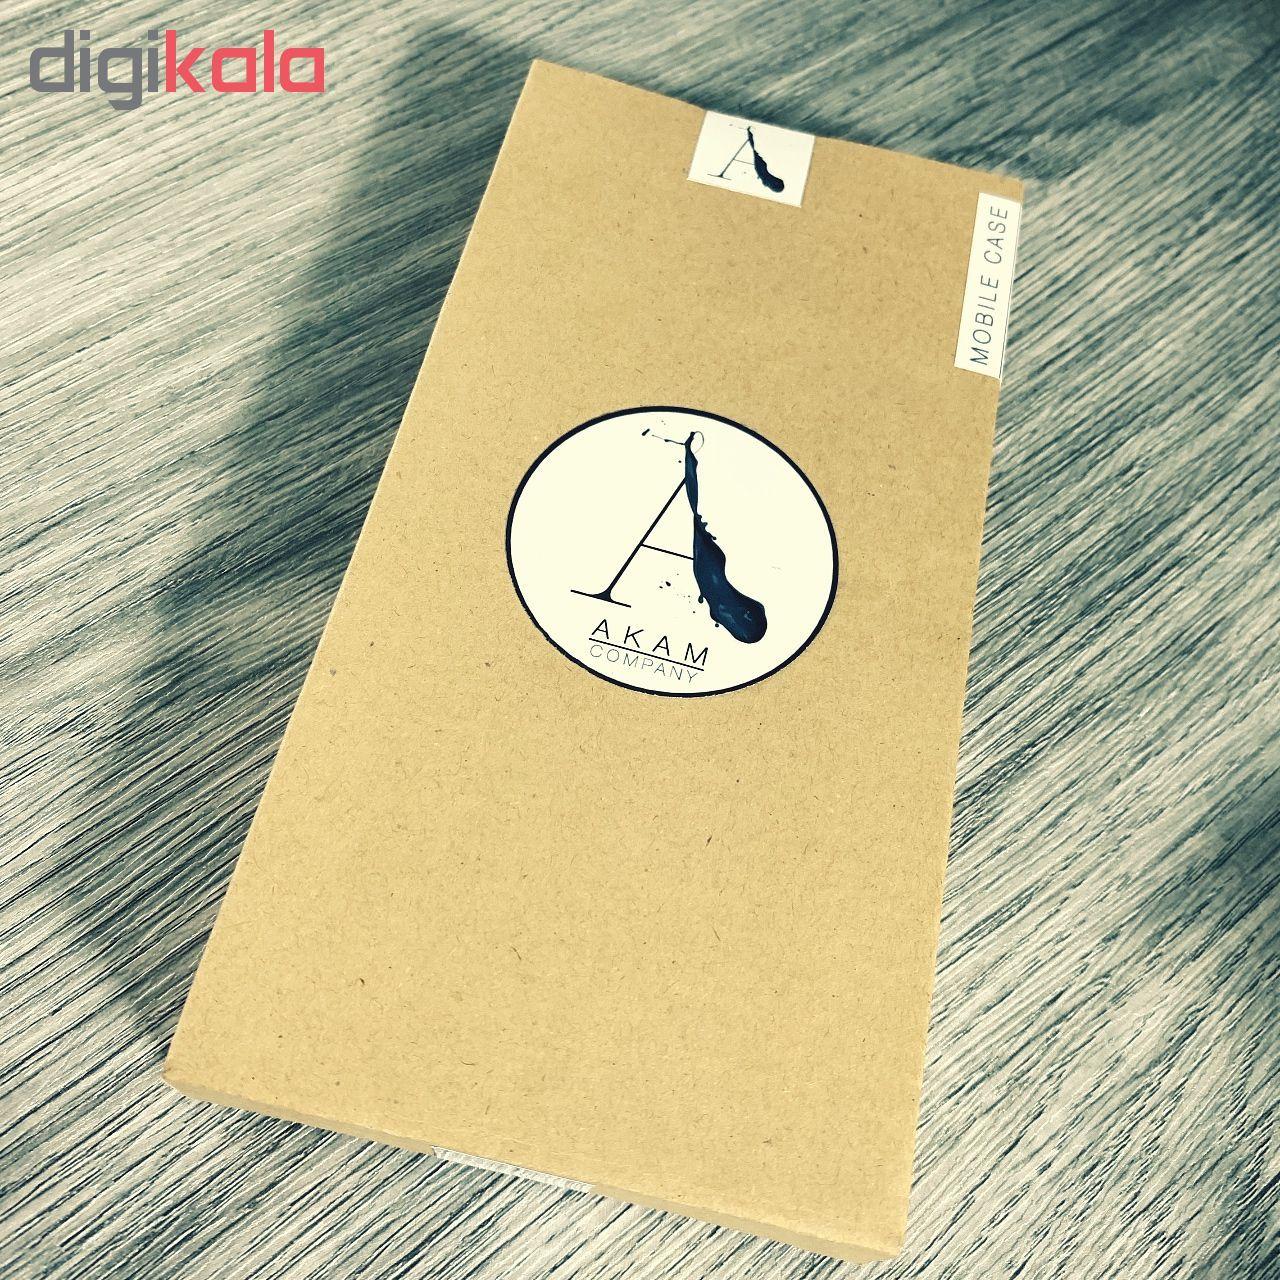 کاور آکام مدل AN90058 مناسب برای گوشی موبایل سامسونگ Galaxy Note 9 main 1 2